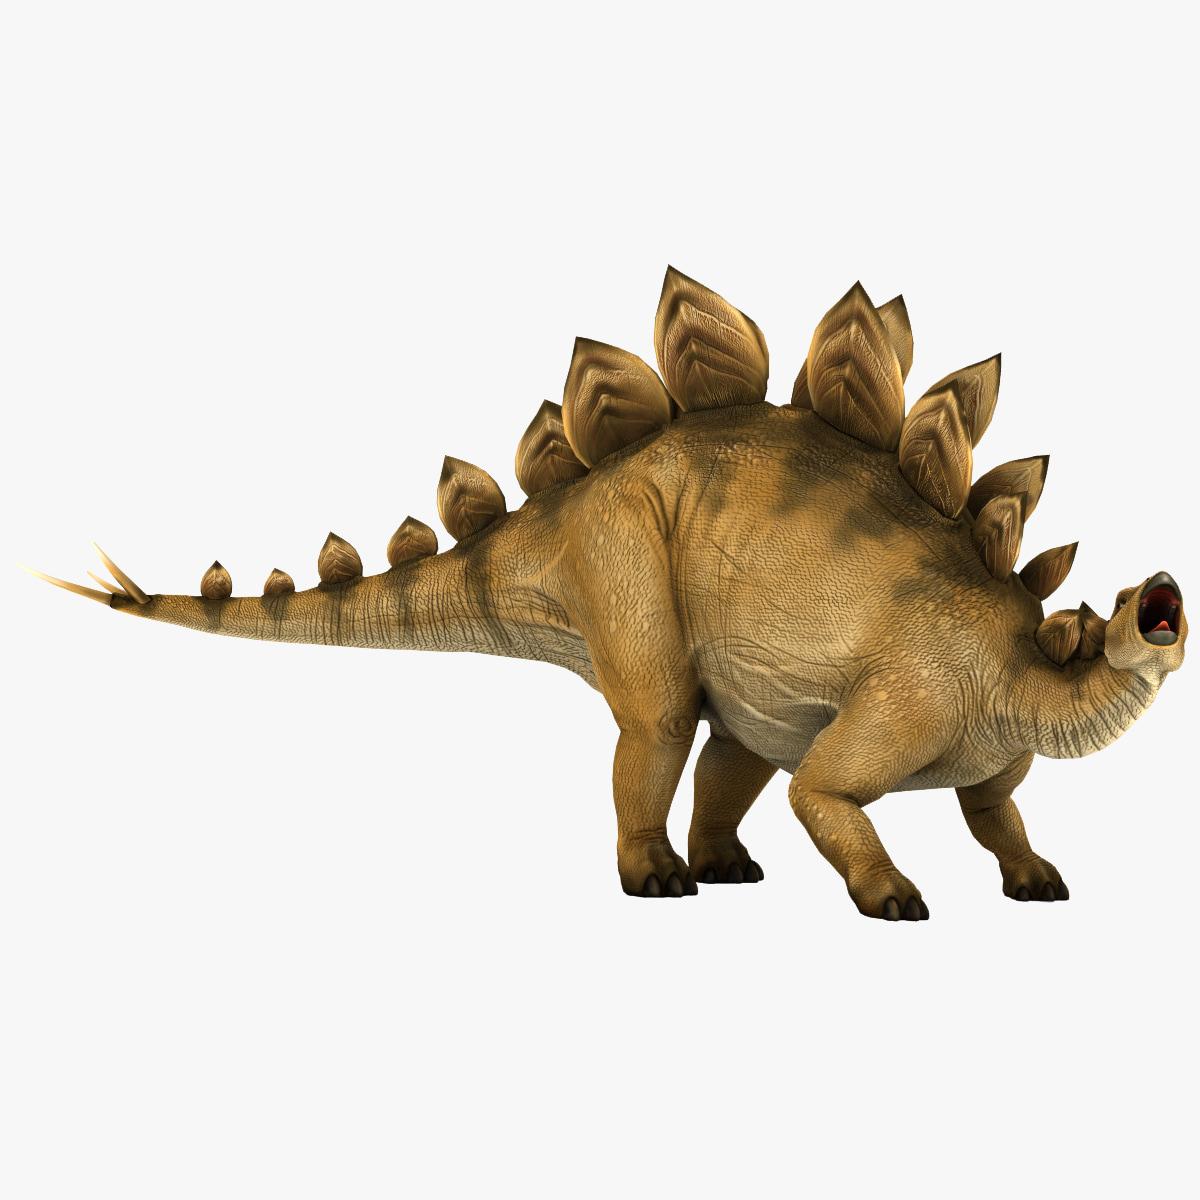 Stegosaurus Pose 2